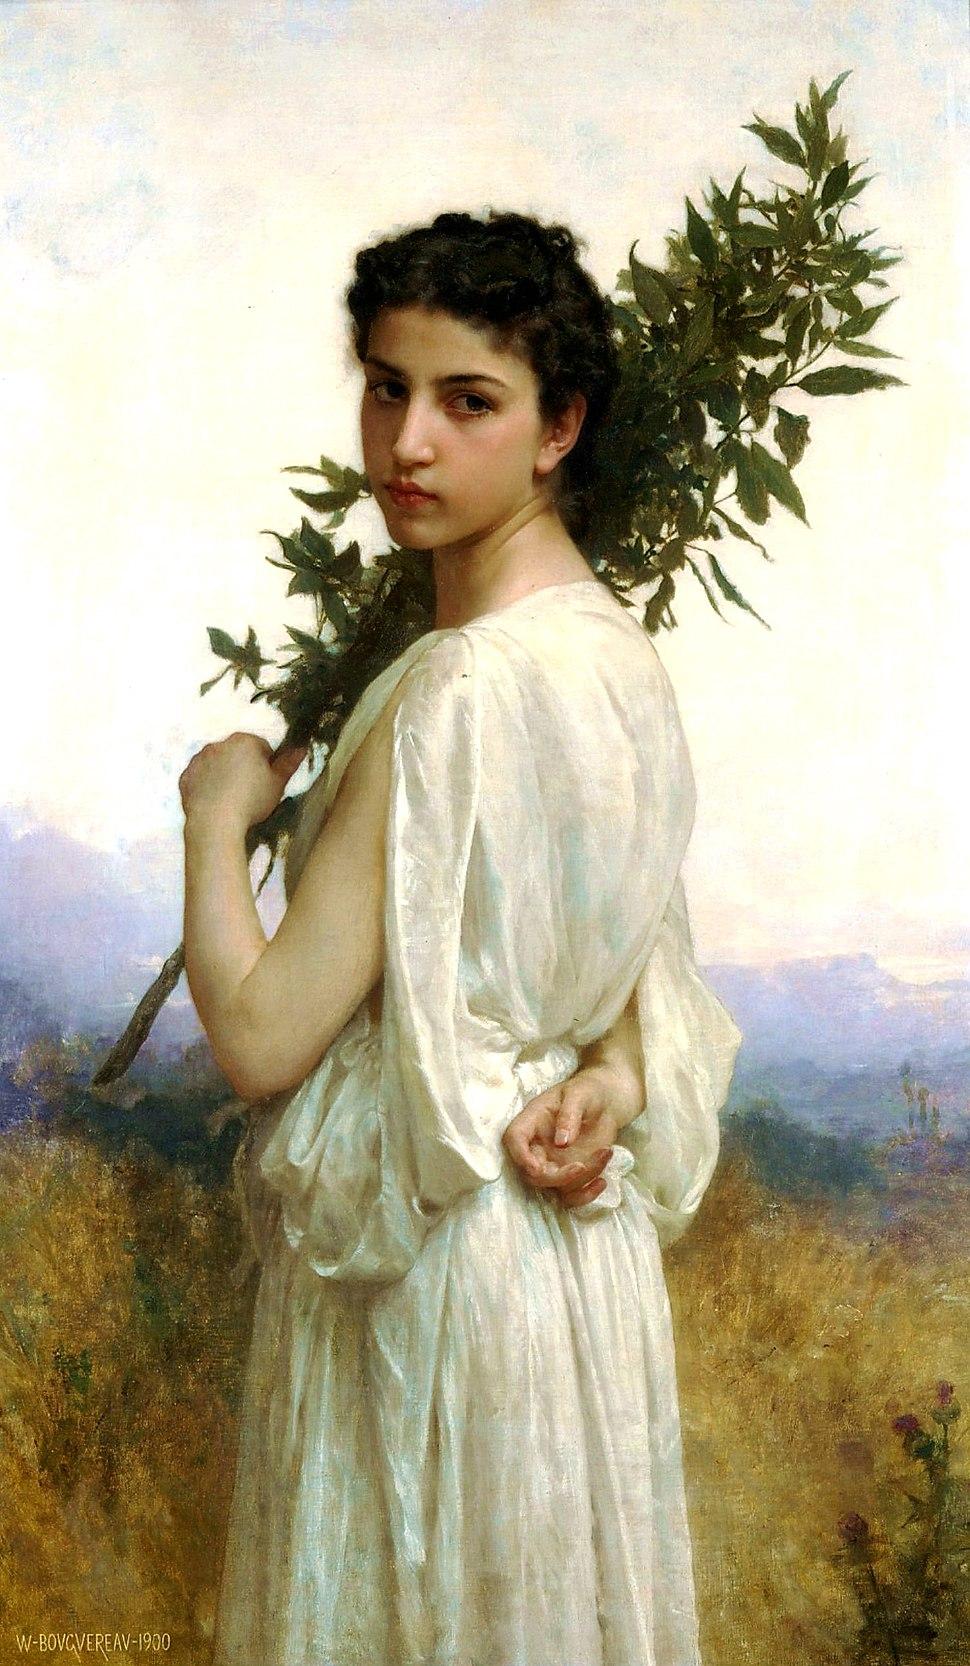 William-Adolphe Bouguereau (1825-1905) - Laurel Branch (1900)